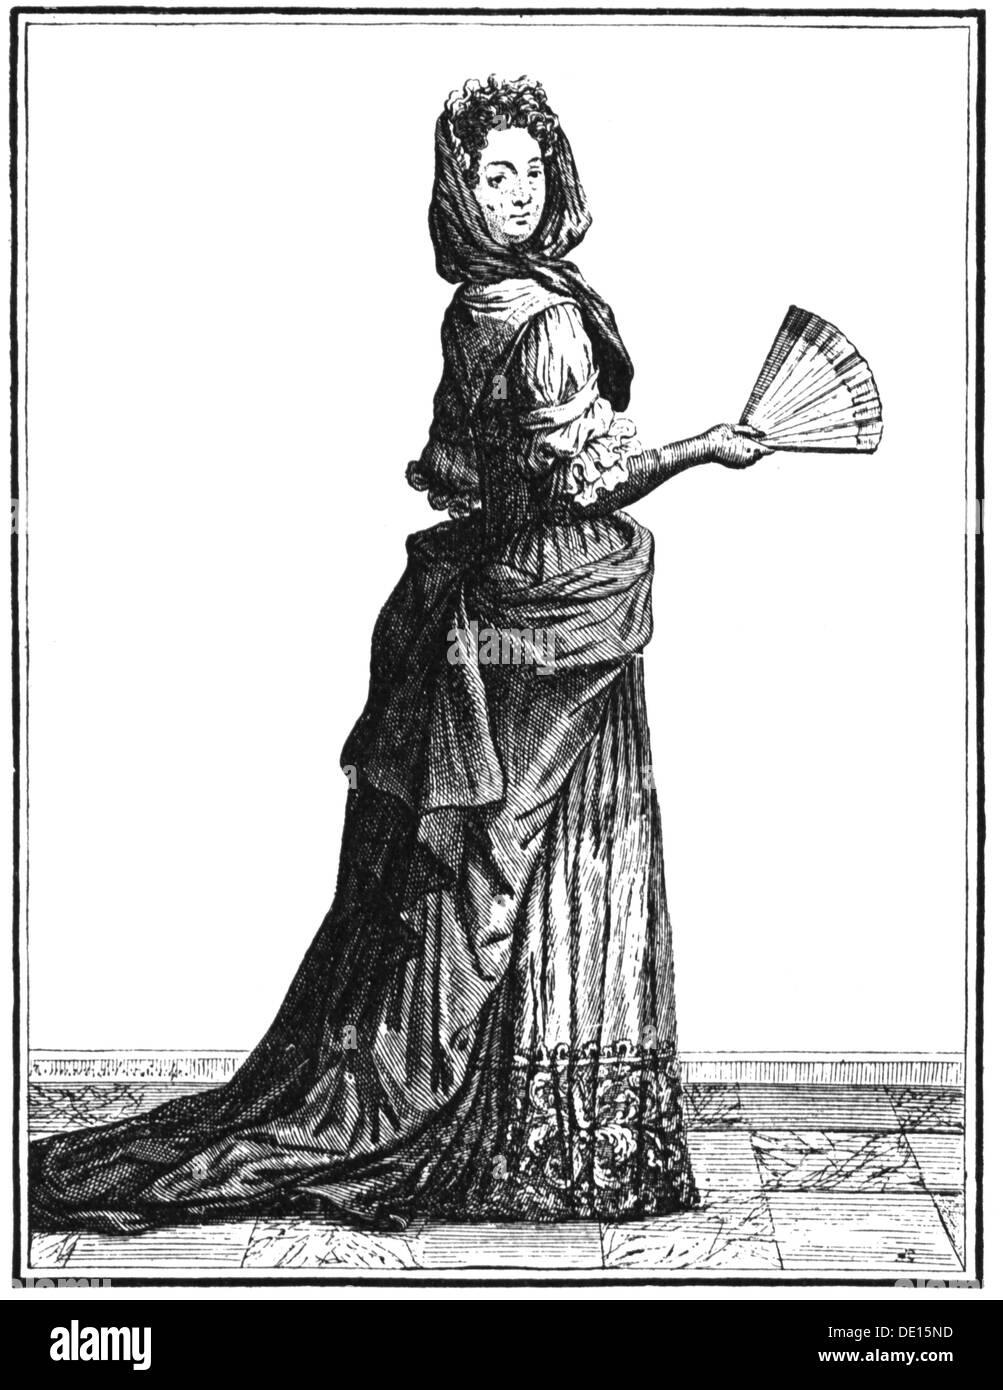 17 Jahrhundert Bild Architektur: Mode 17. Jahrhundert Dame Der Barockzeit Kupfer Gravur 17